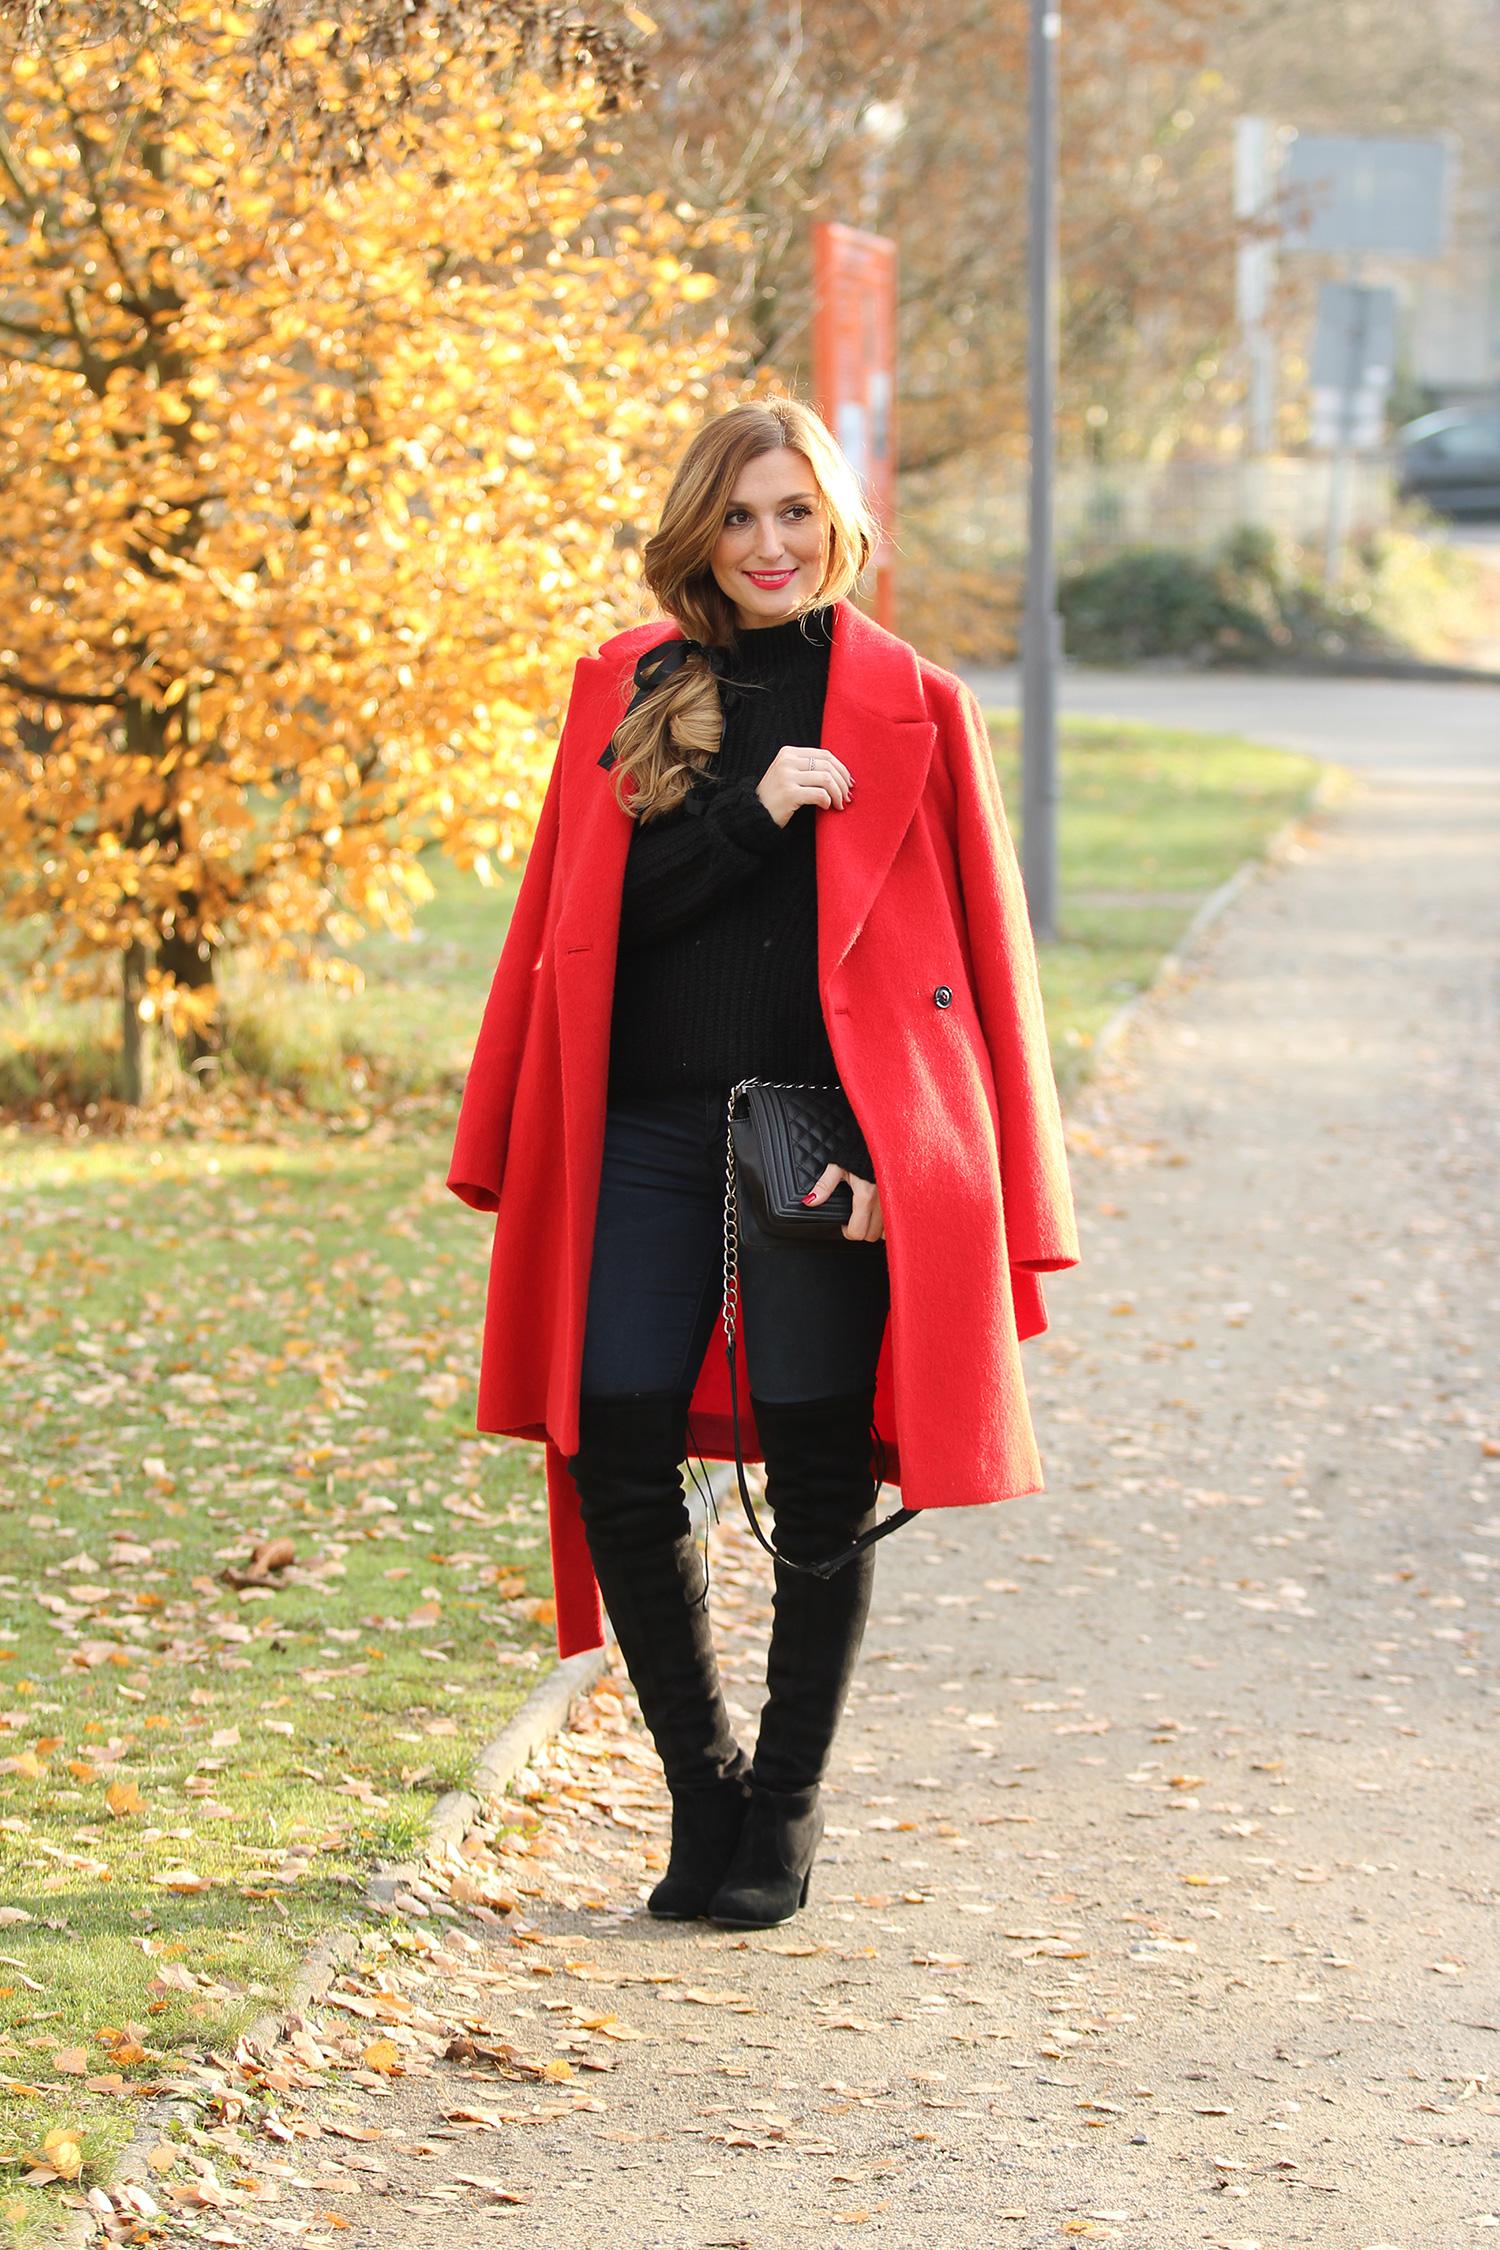 September Favoriten 2017 Monatsr Ckblick Blog Des Monats Fashionstylebyjohanna 1 Bezaubernde Nana